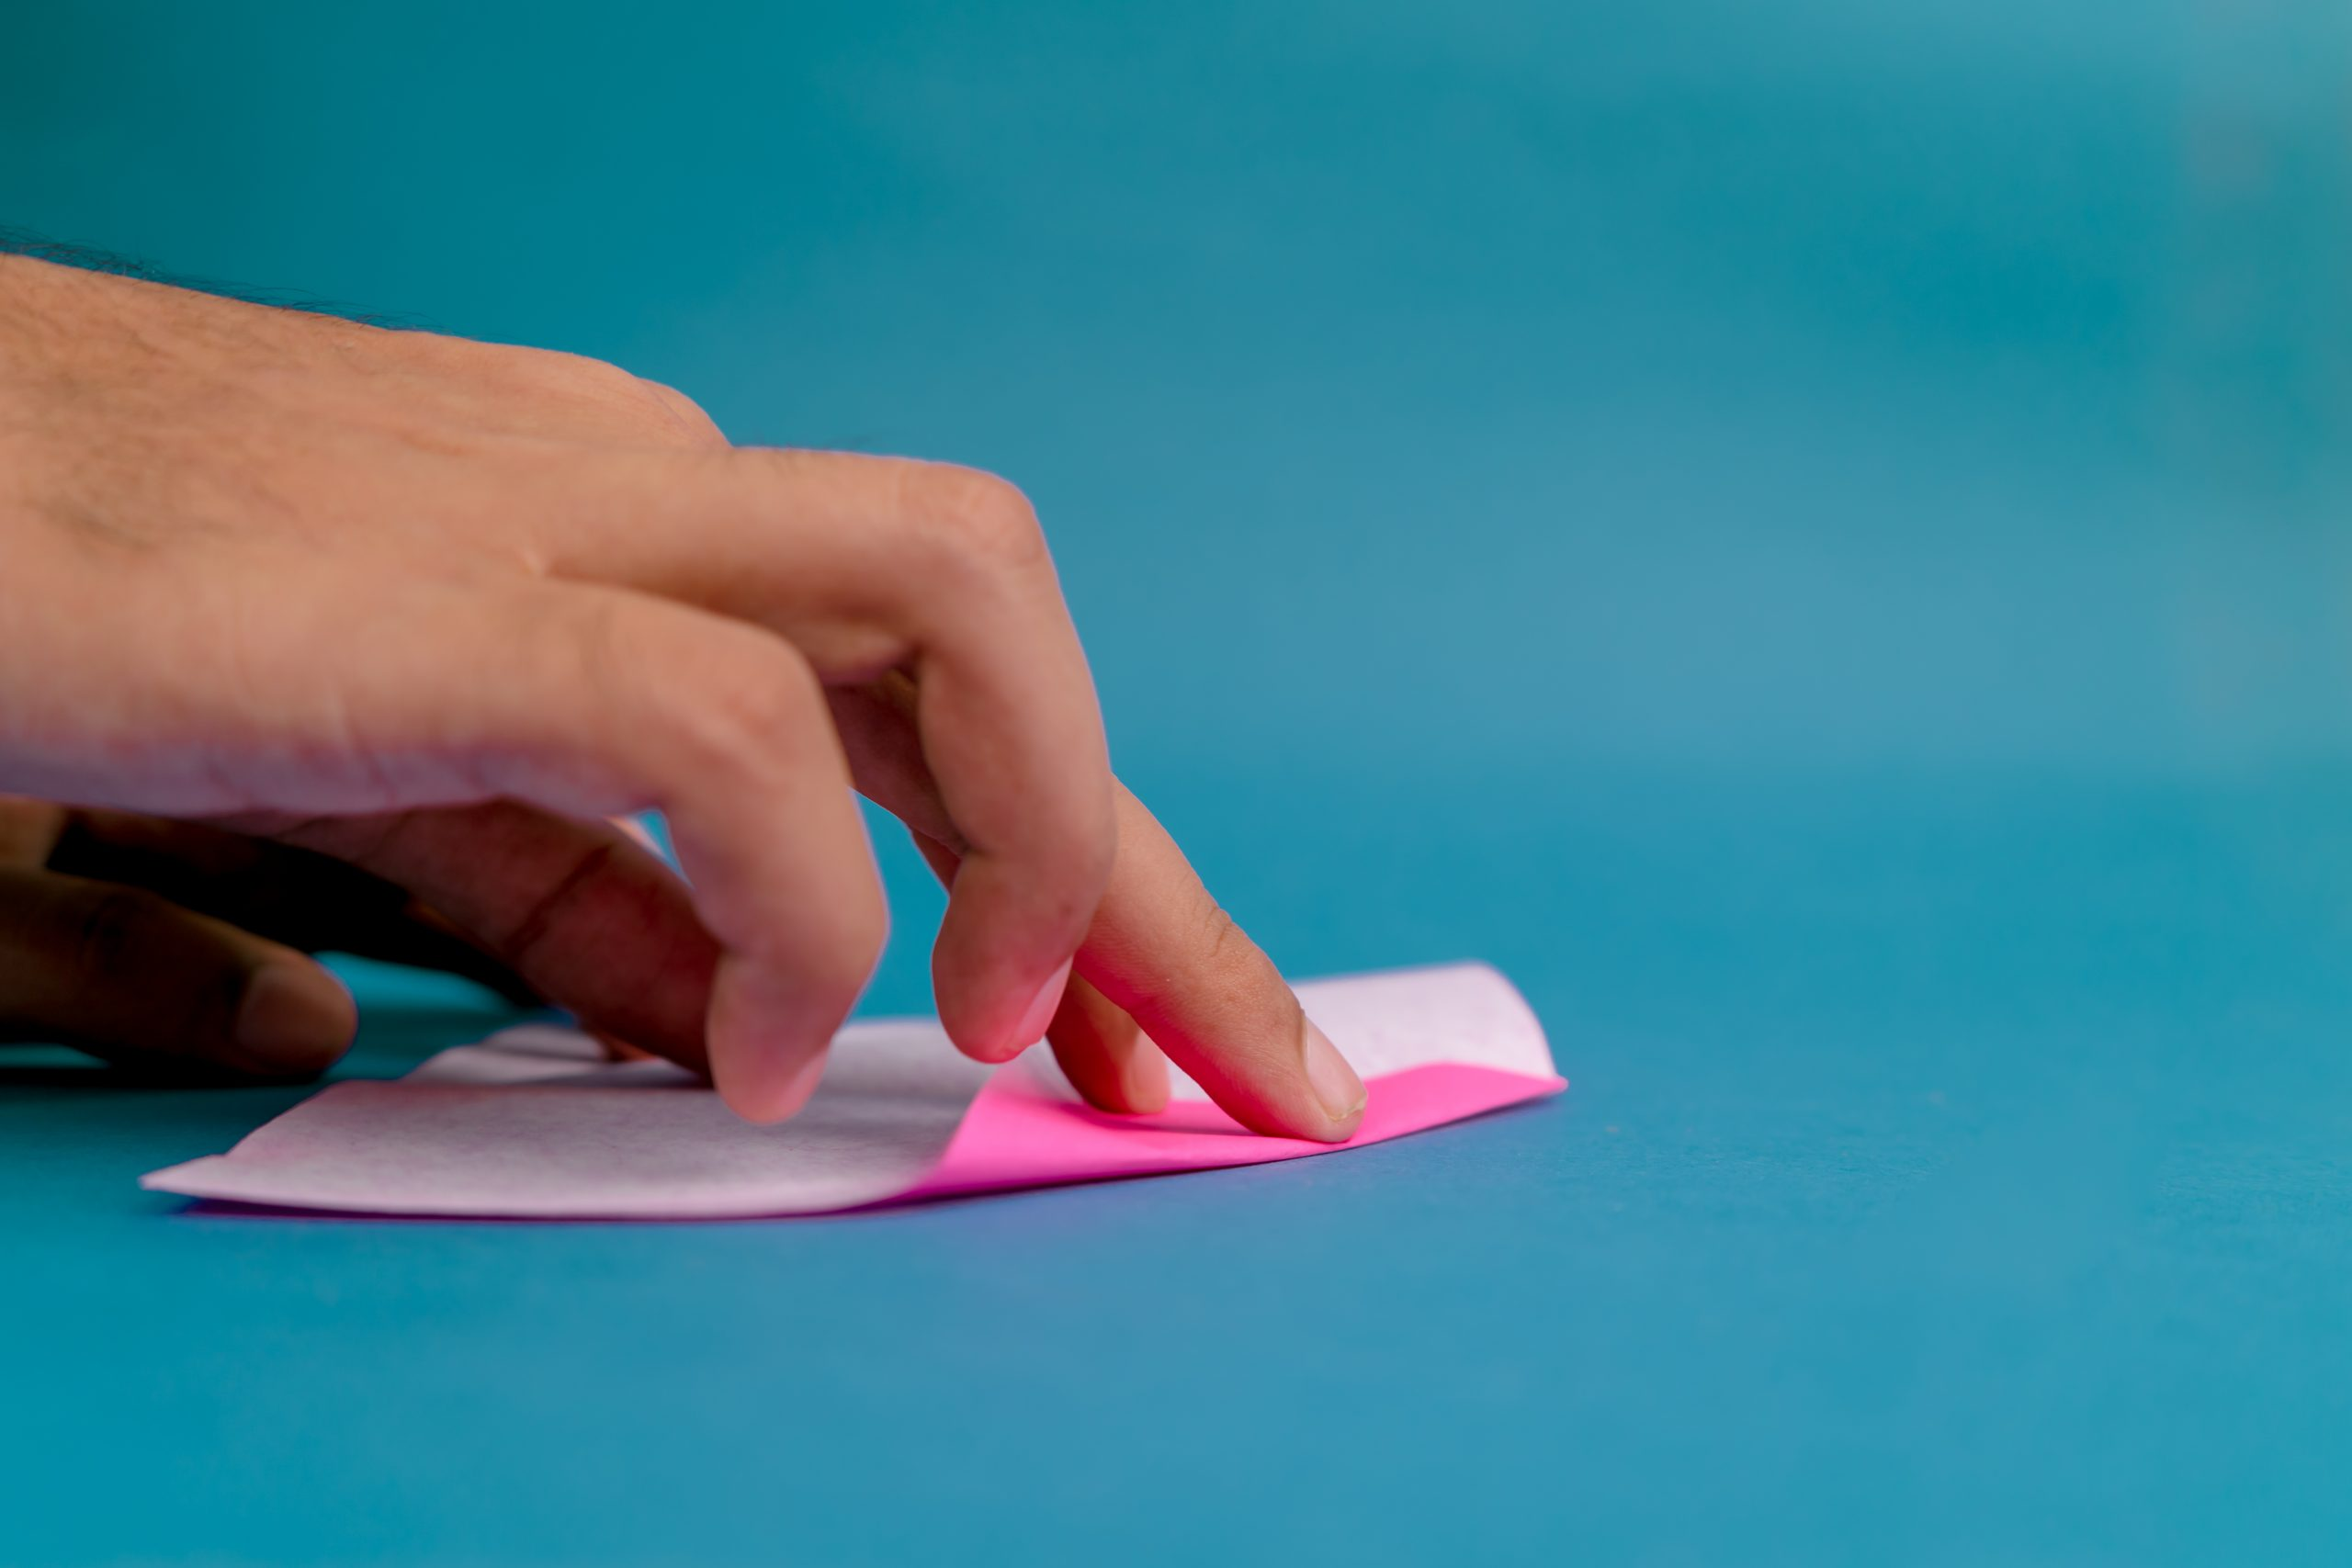 Origami making